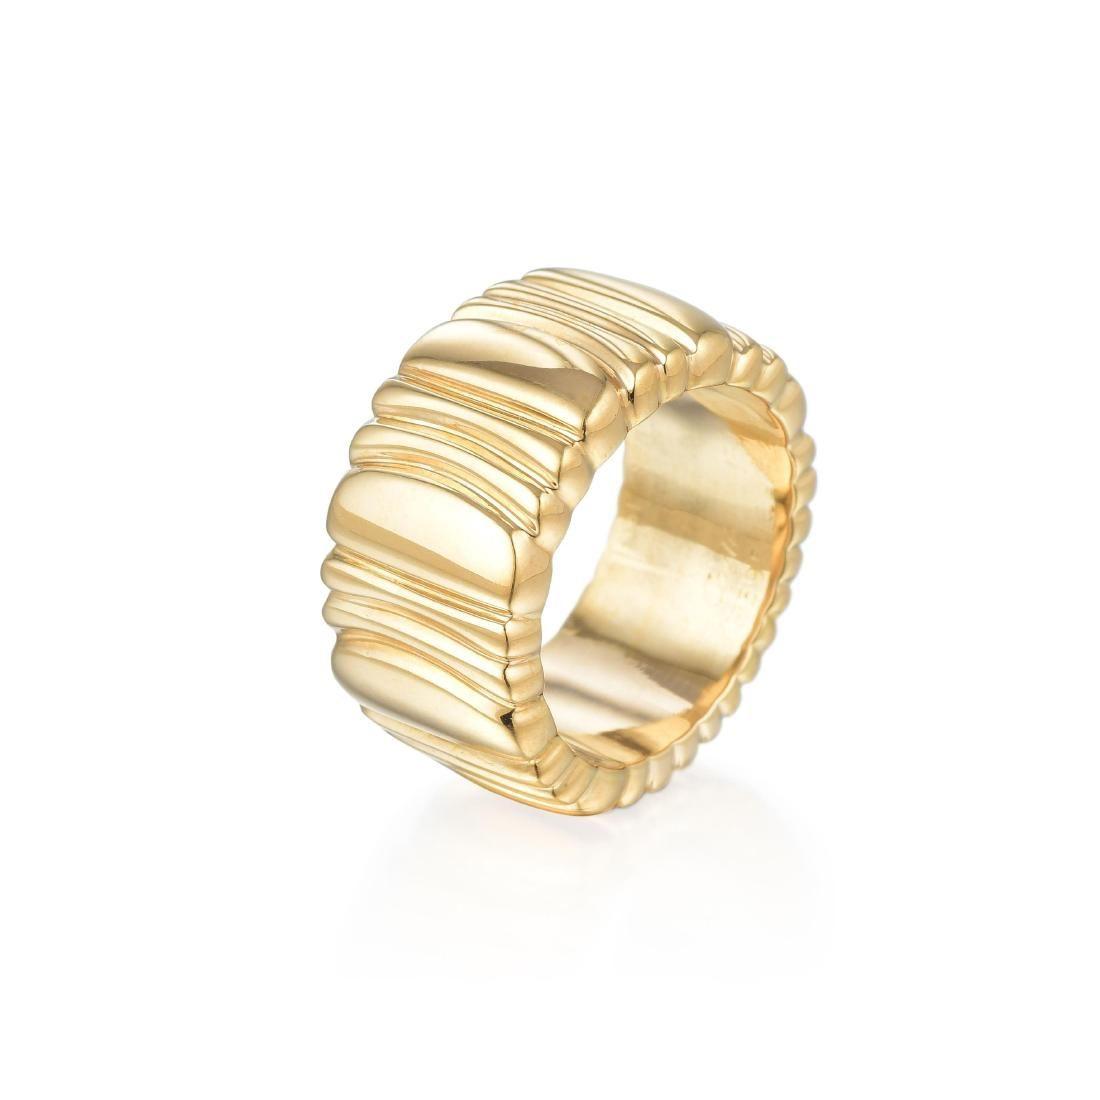 Cartier Gold Band